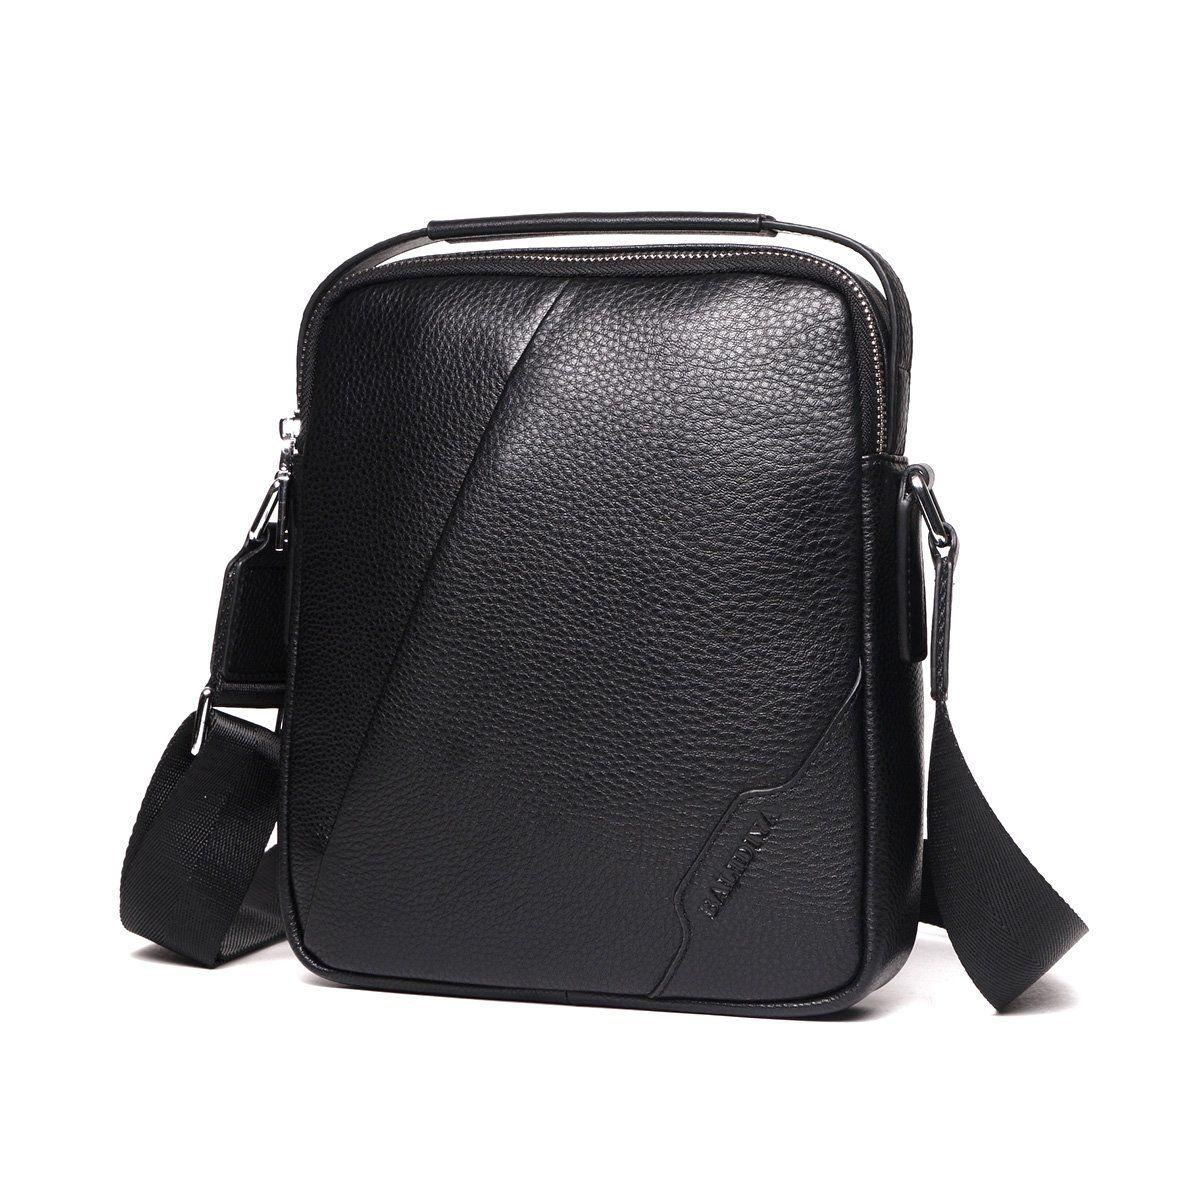 Zicac Sac Homme Bandouliere Cuir Noir Petite Sacoche Pochette Besace Vintage Sac A Main Sac A Epaule Leger Casual Pour Travail Vo Sac Bandouliere Sac Homme Sac